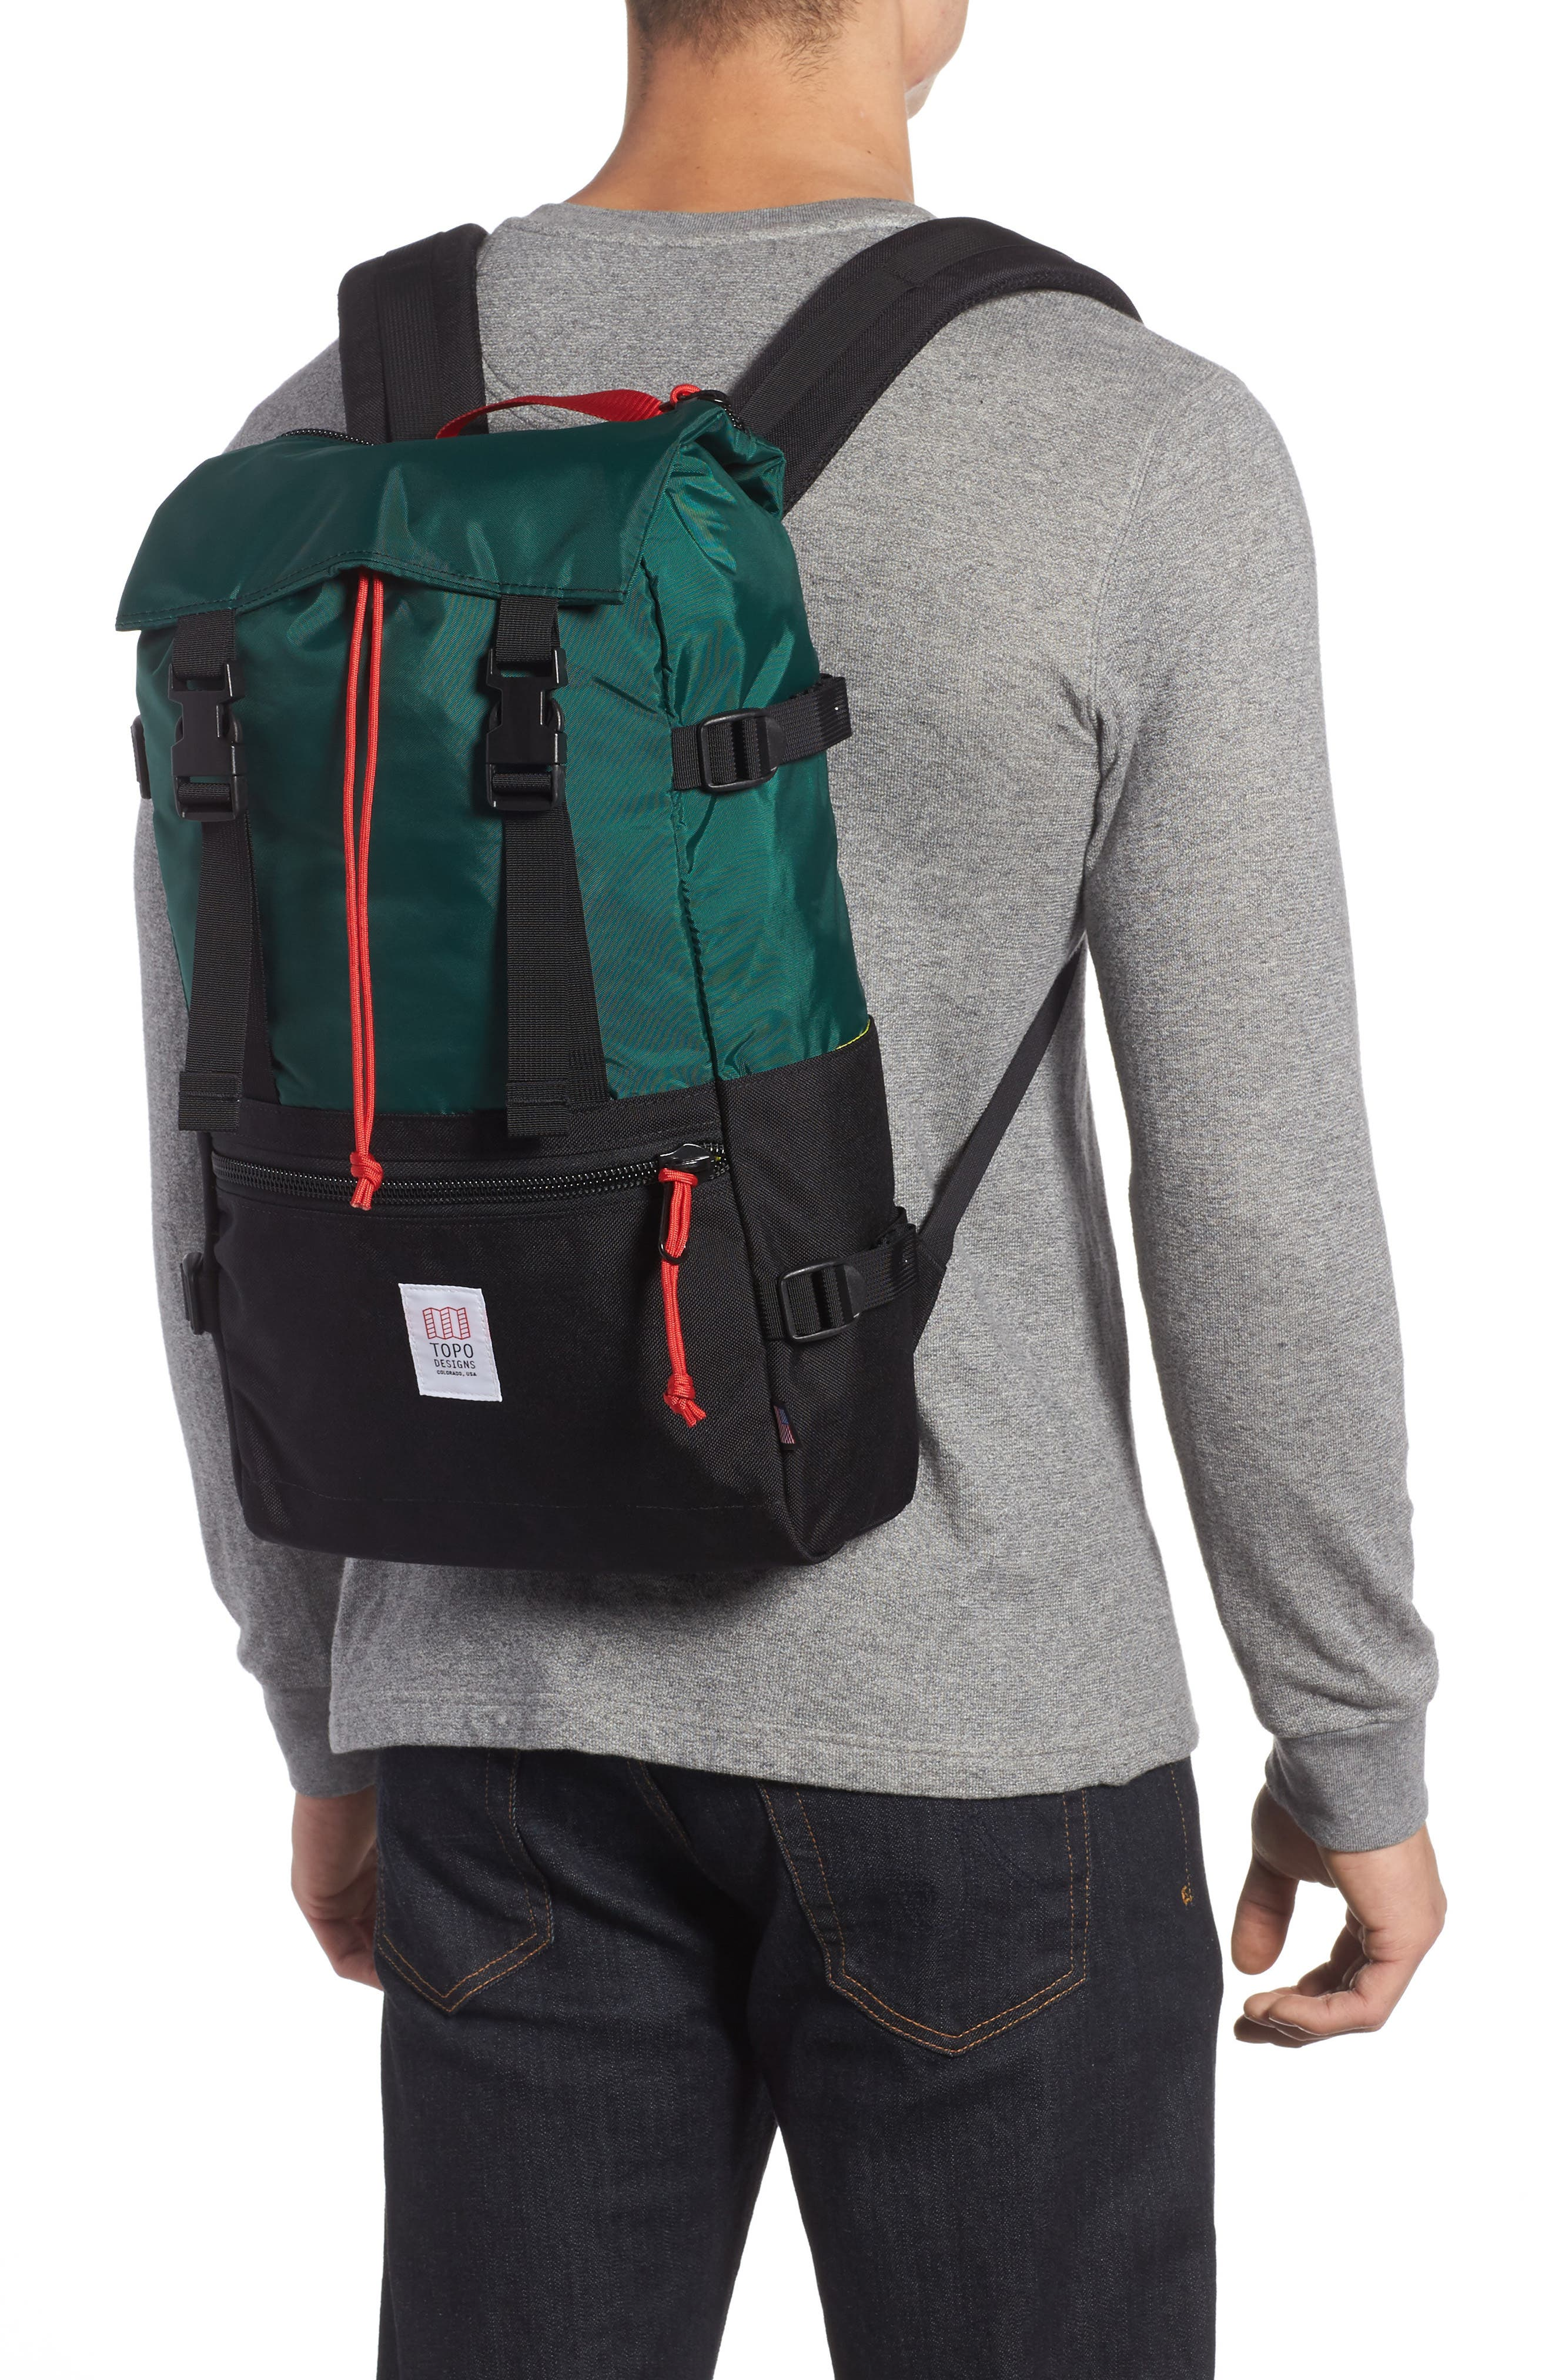 Rover Backpack,                             Alternate thumbnail 2, color,                             FOREST/ BLACK